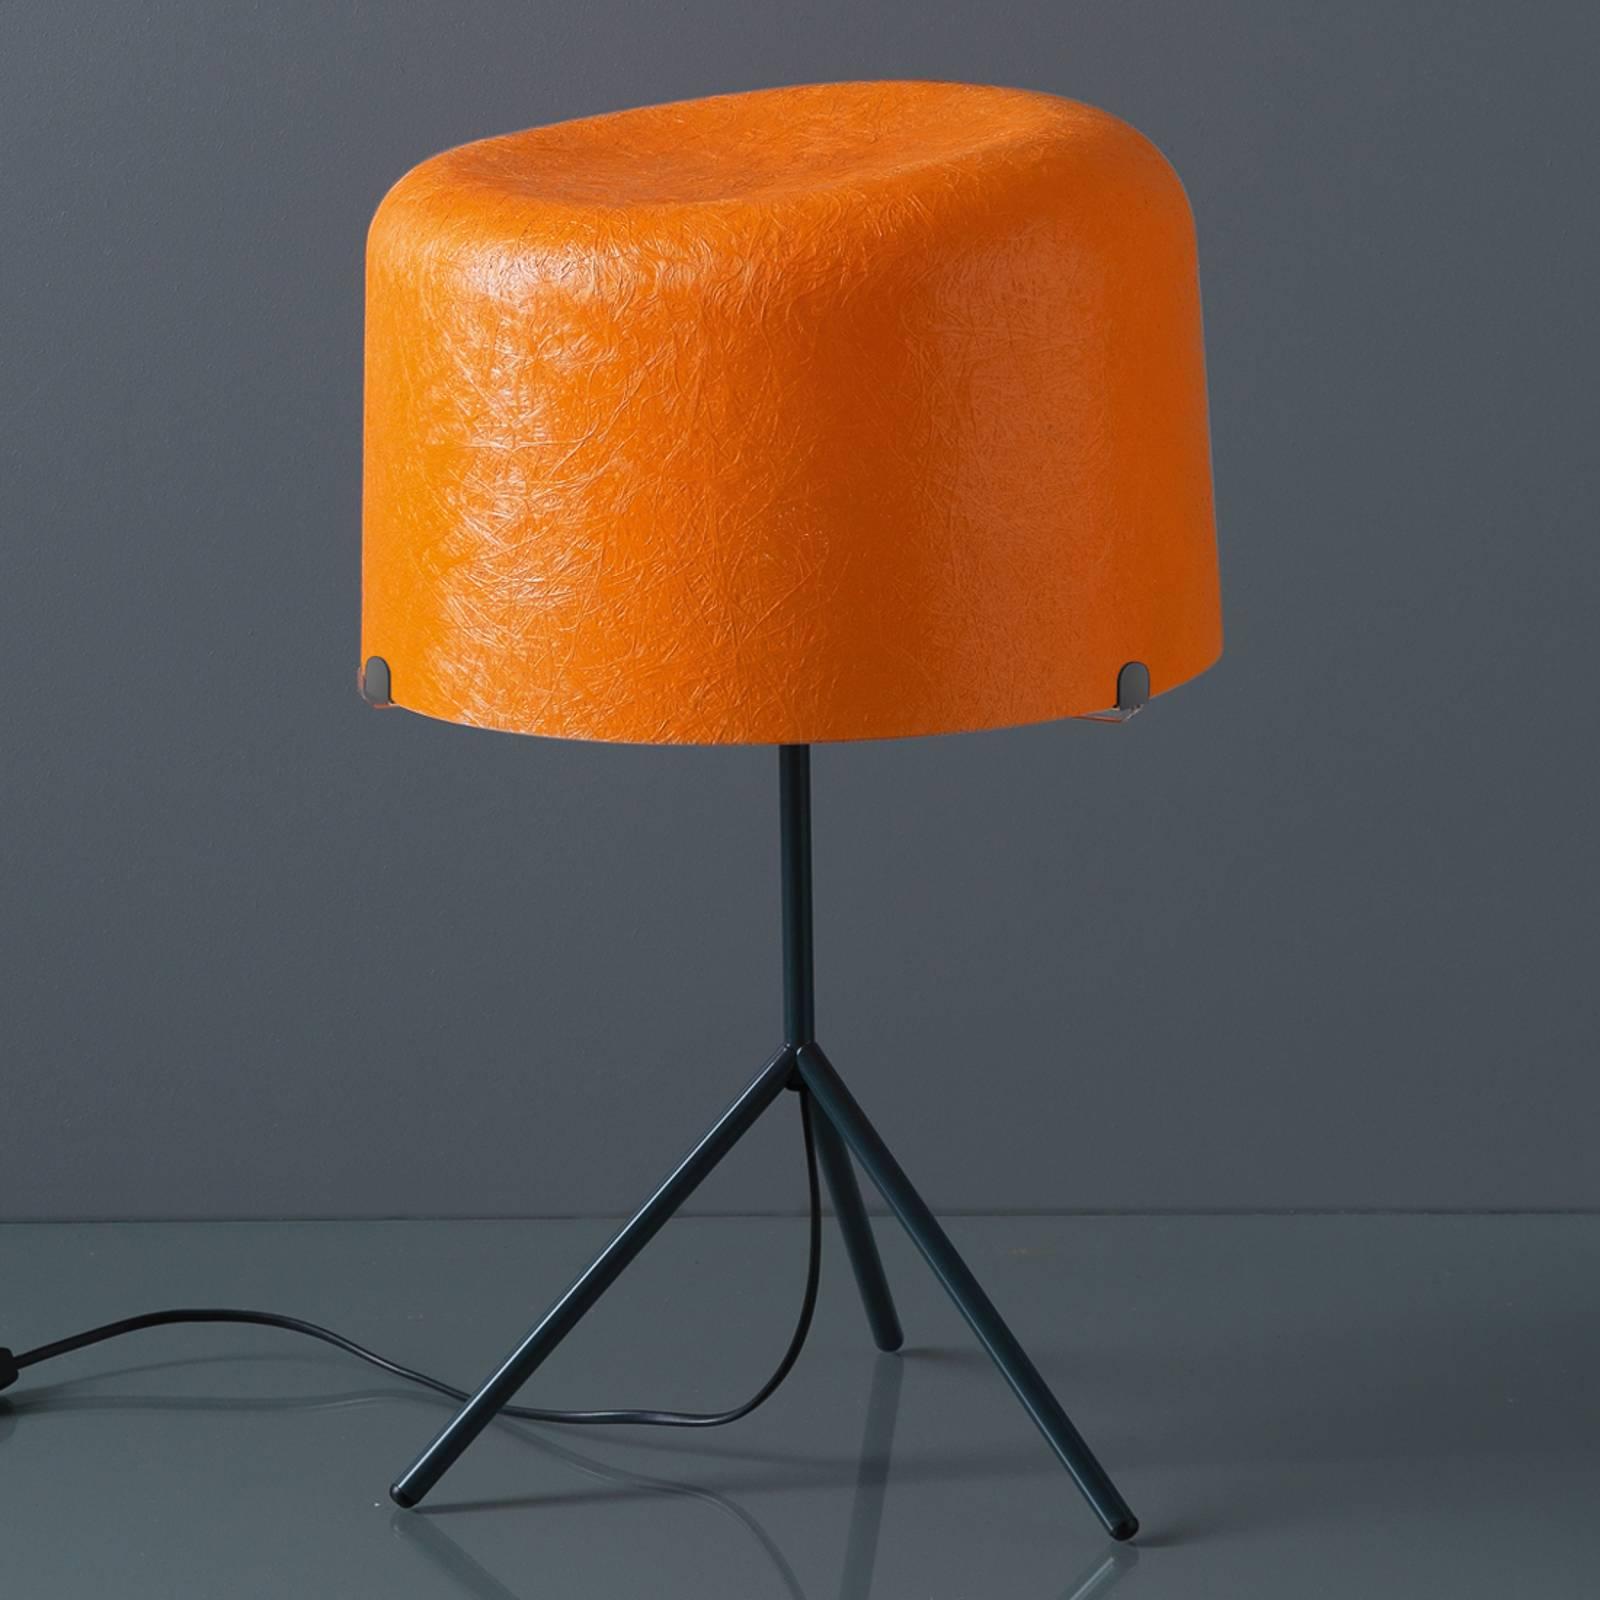 Pöytävalaisin Ola lasikuitua, oranssi, K 53 cm